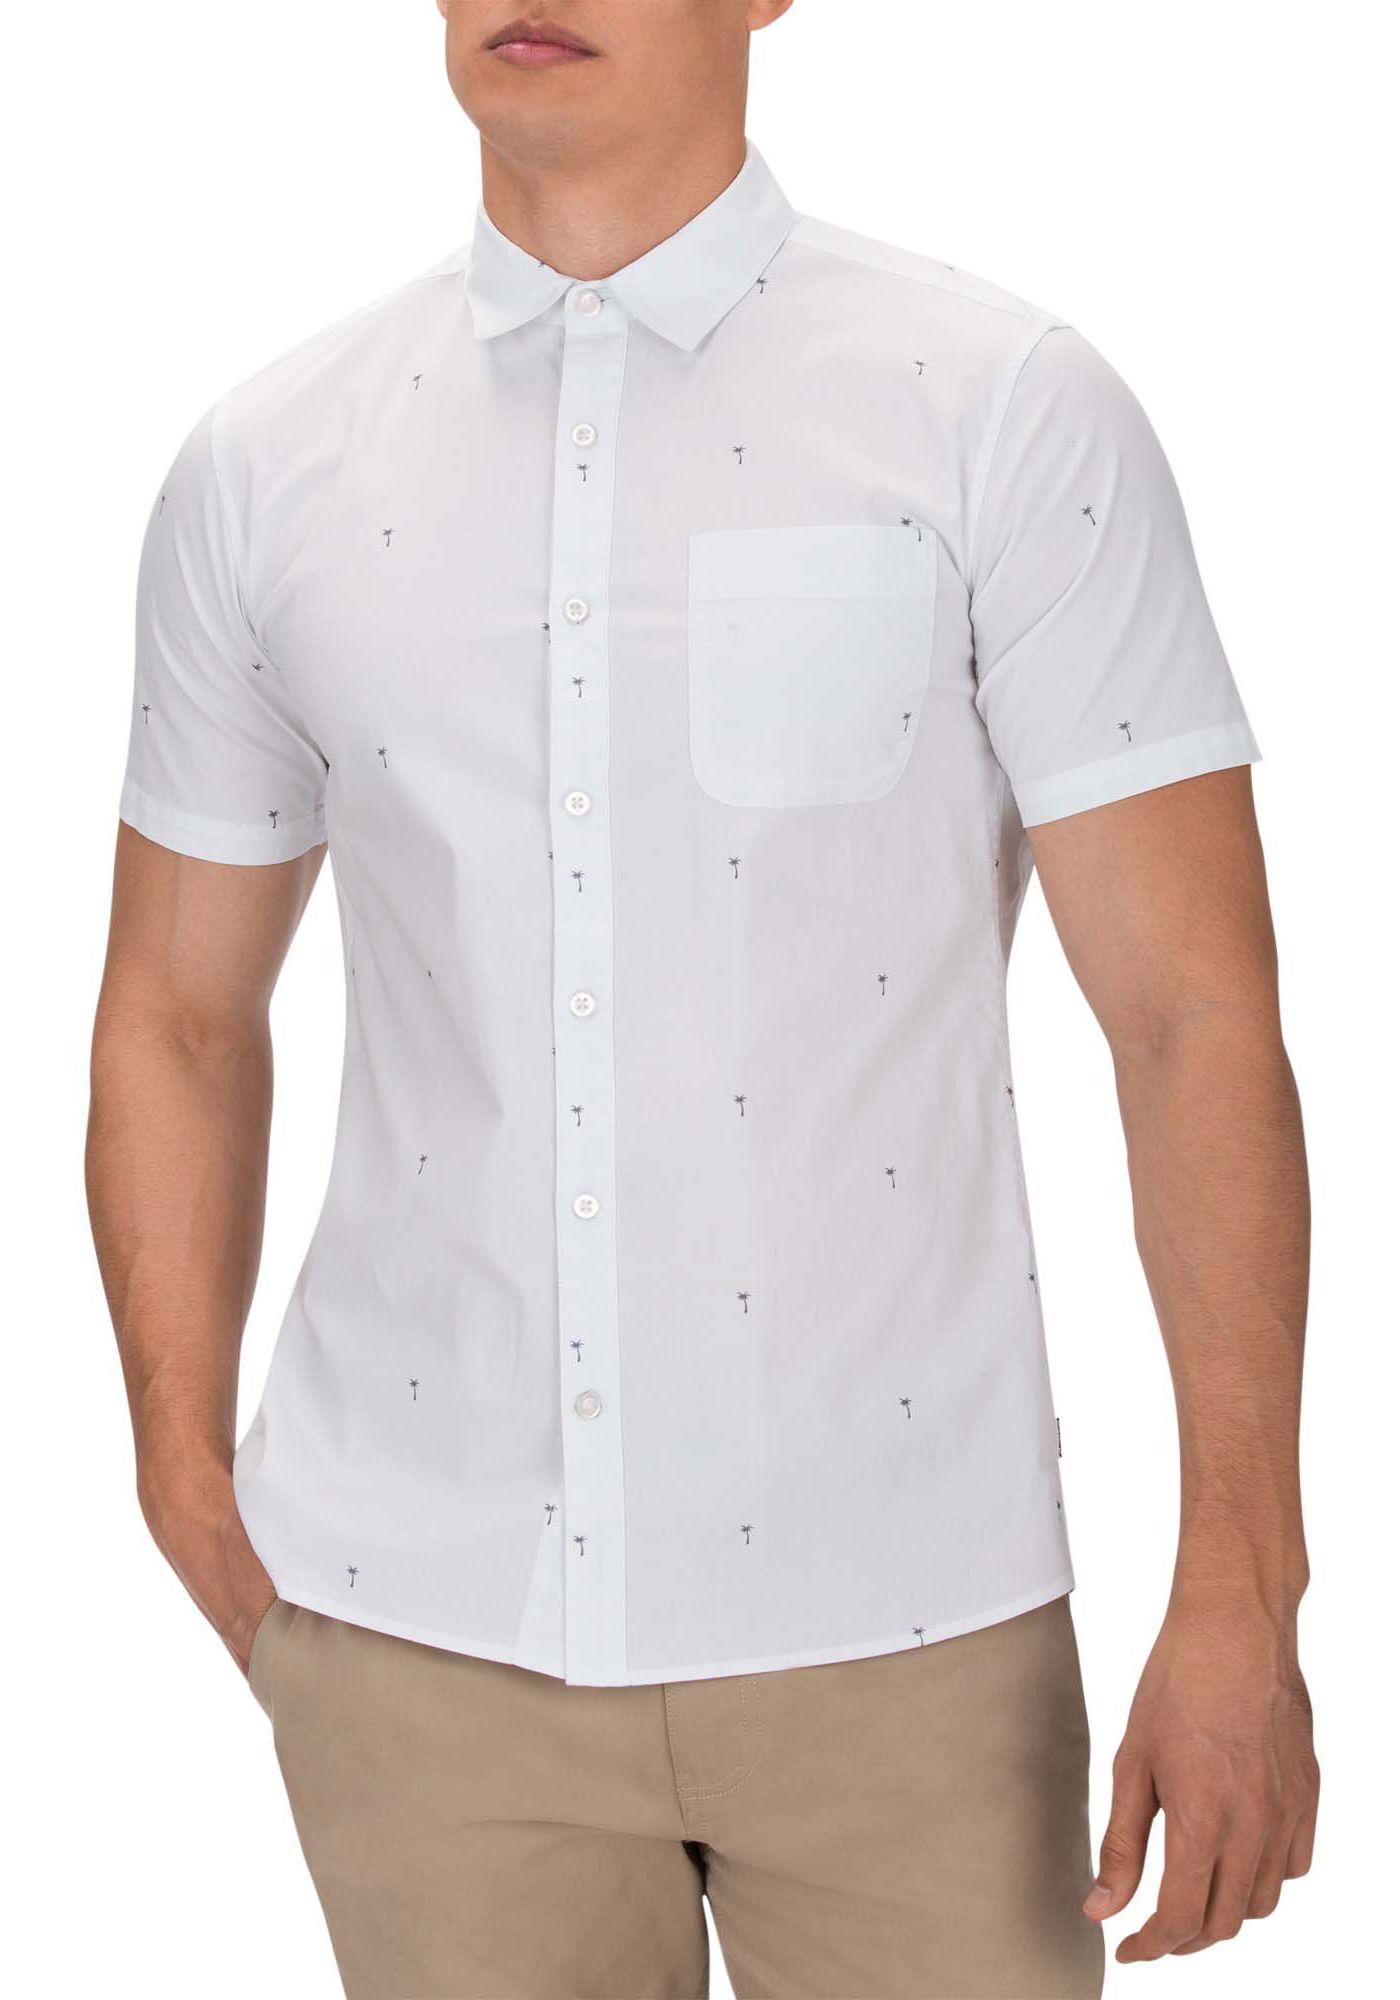 Hurley Men's Palms Woven Short Sleeve Shirt